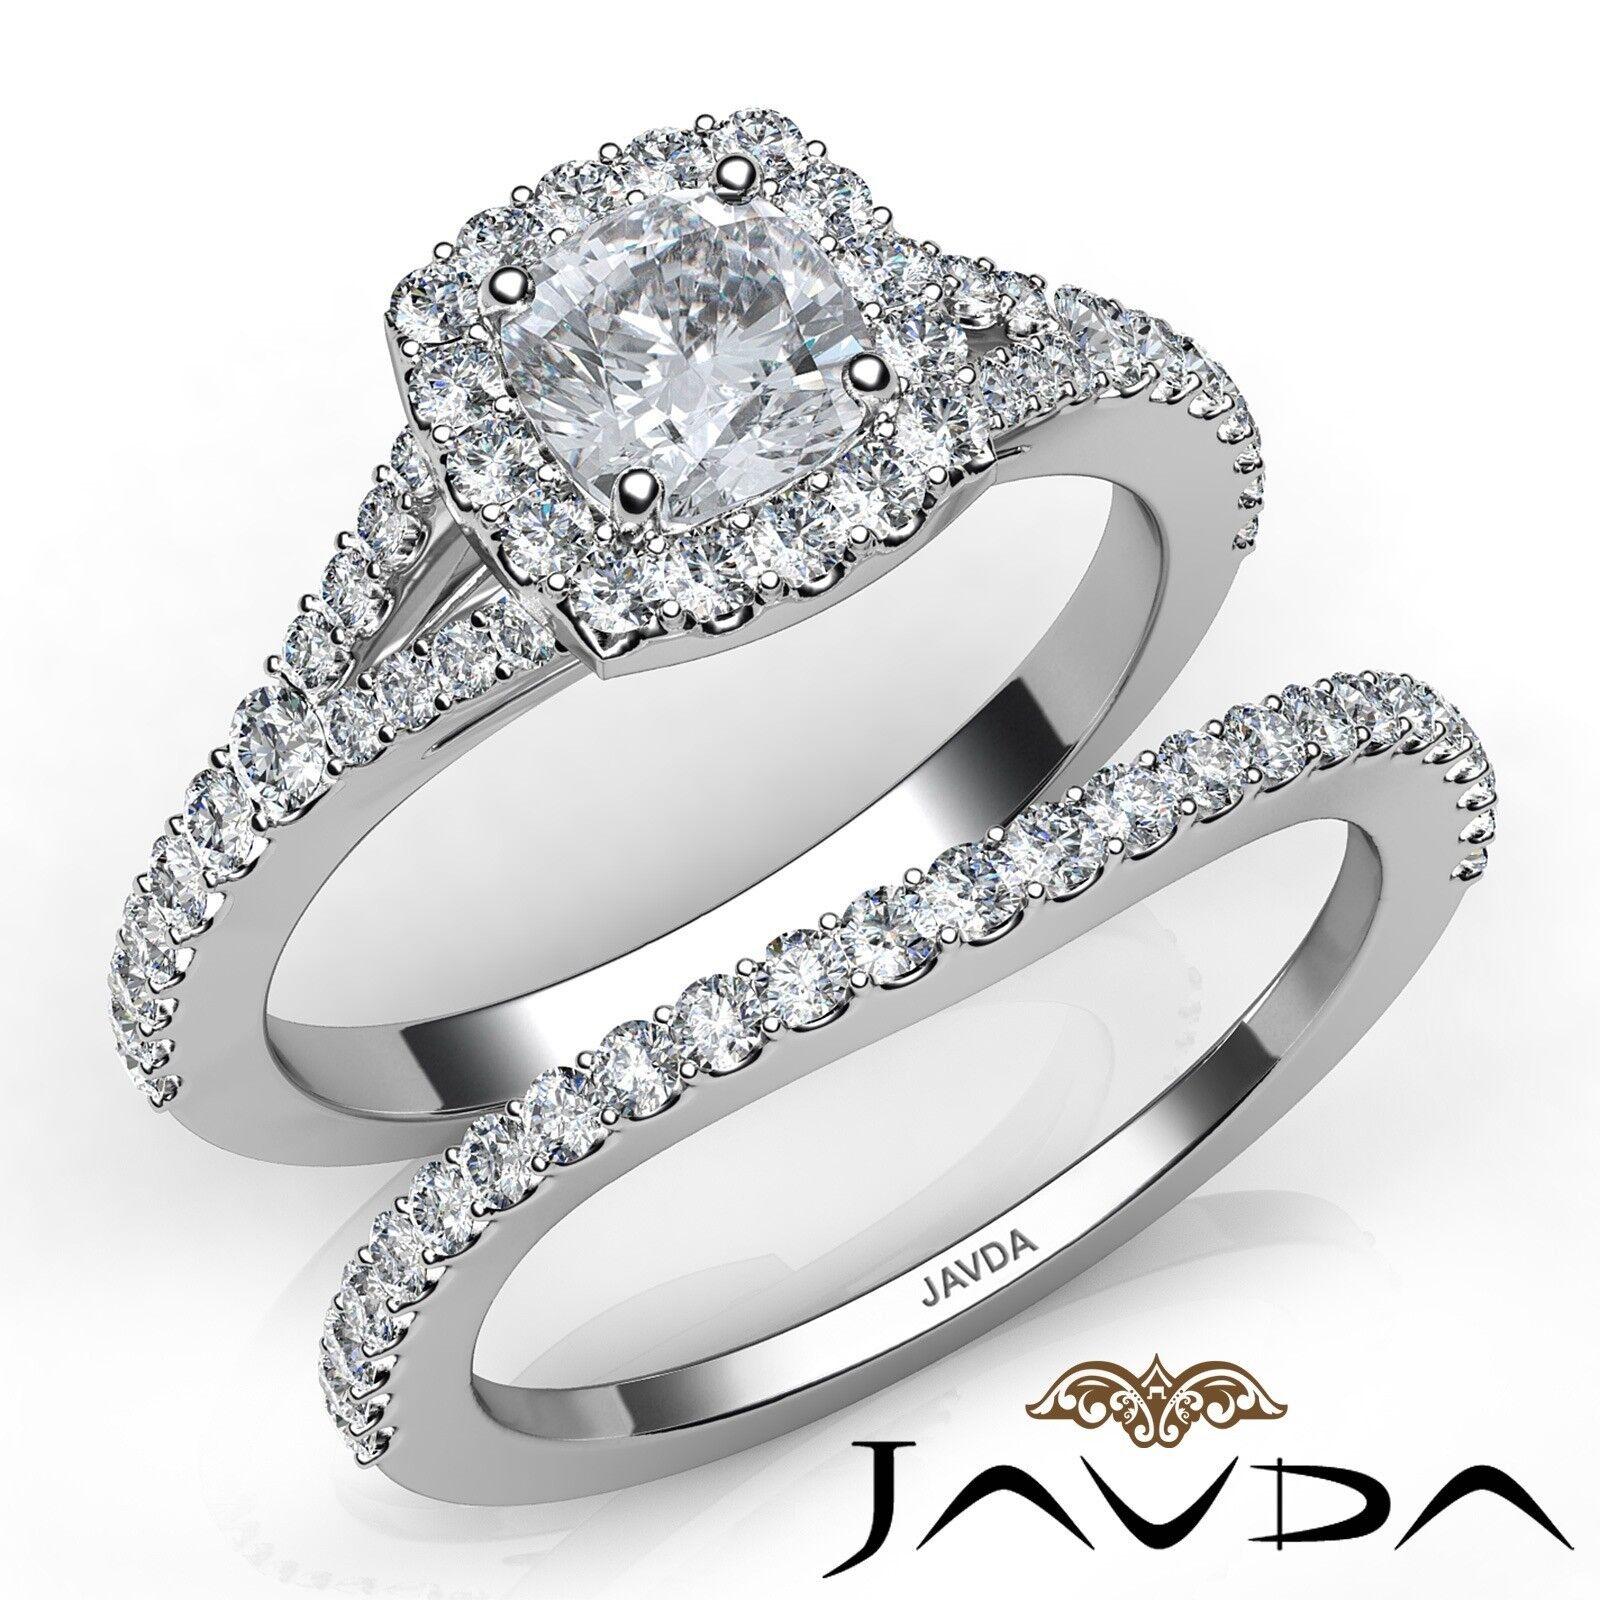 1.36ctw U Cut Pave Halo Bridal Cushion Diamond Engagement Ring GIA I-VS1 W Gold